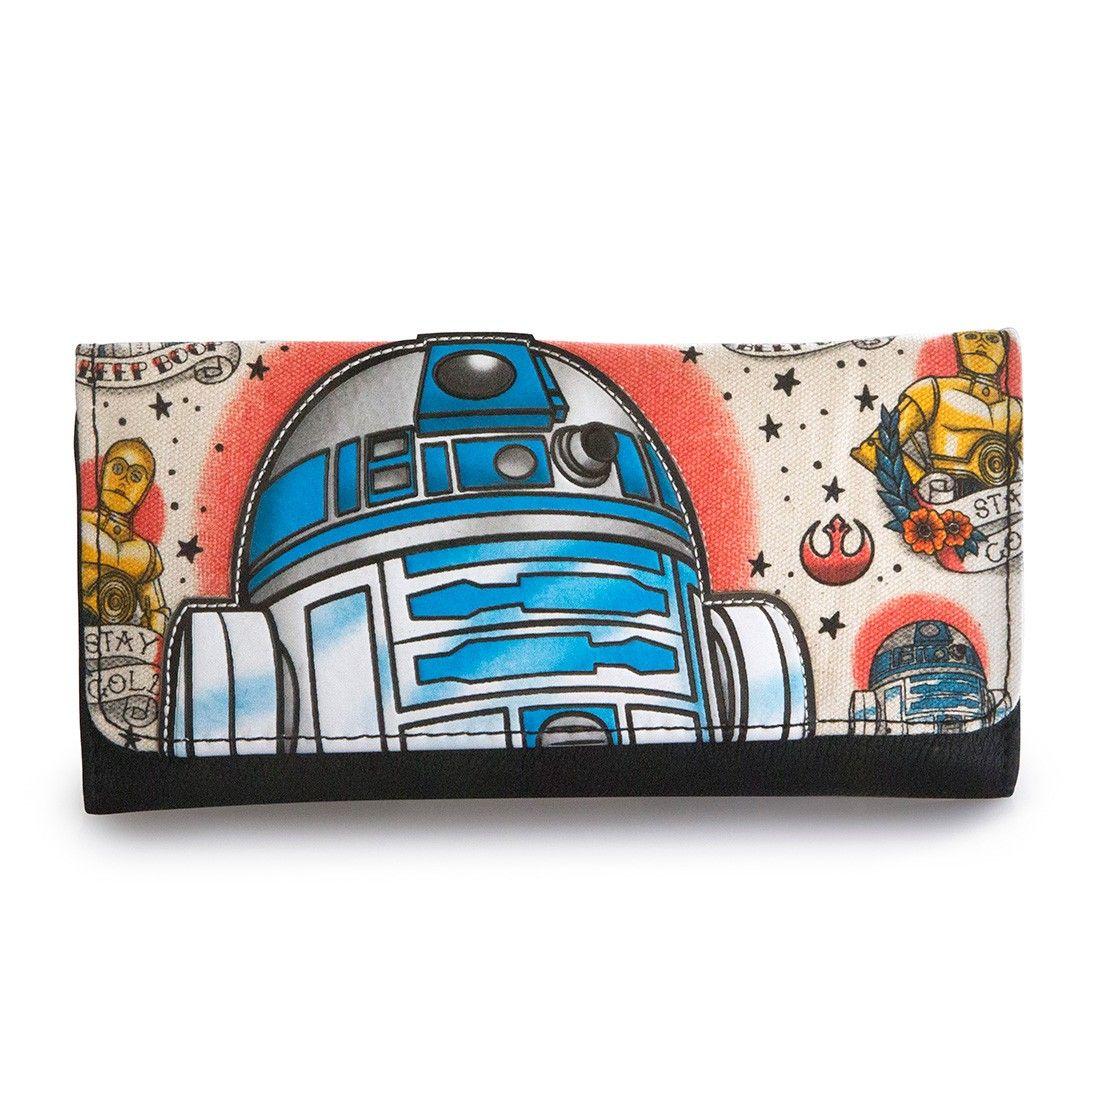 Loungefly x Star Wars: R2-D2 Tattoo Wallet - Star Wars - Brands